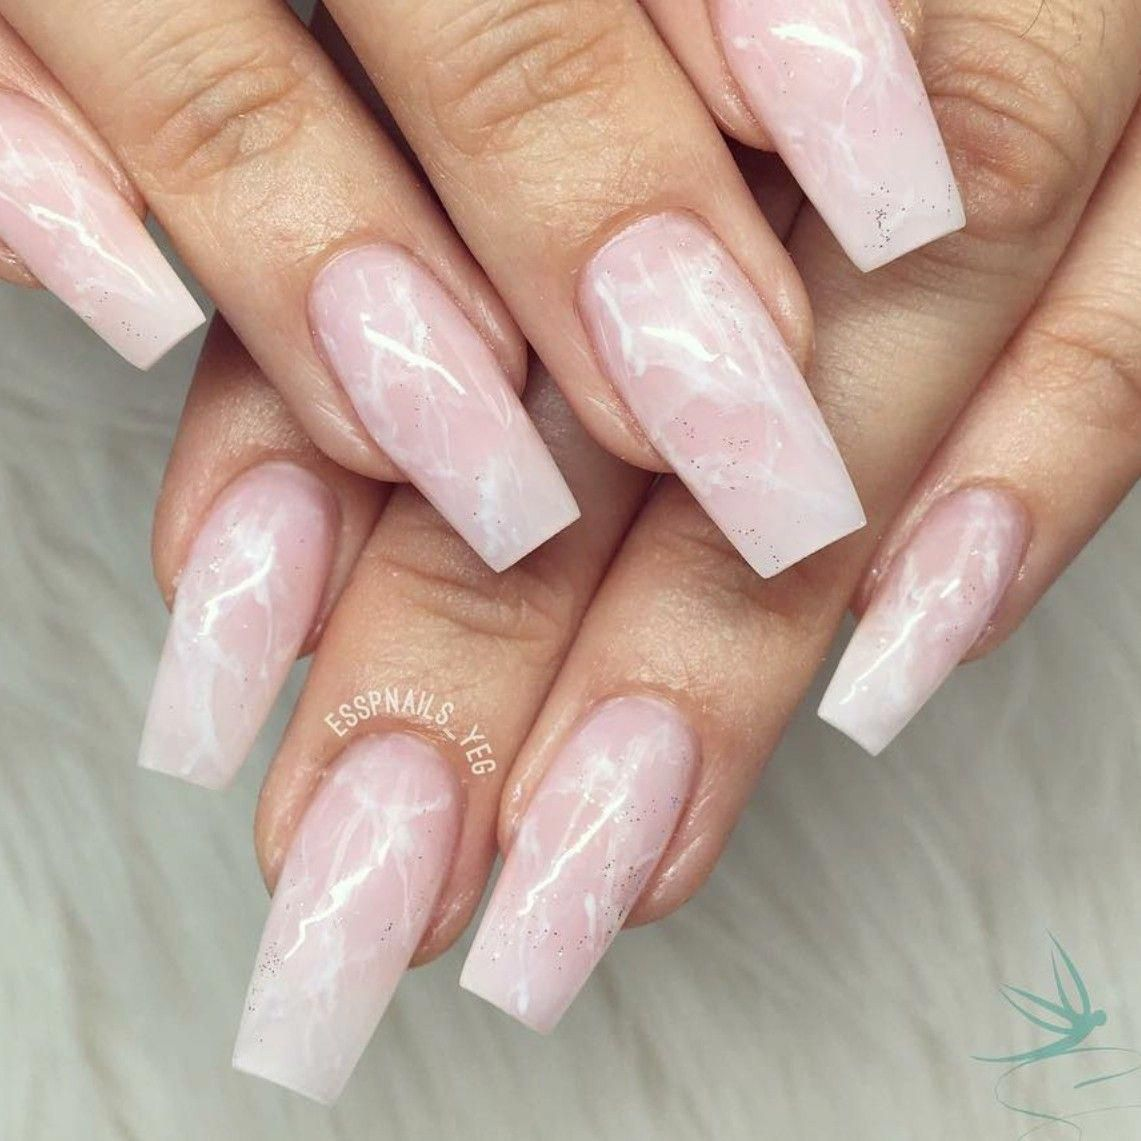 30 Stylish White Nail Designs Bridal Ideas Wedding Forward In 2020 Bride Nails White Nail Designs Bridal Nails